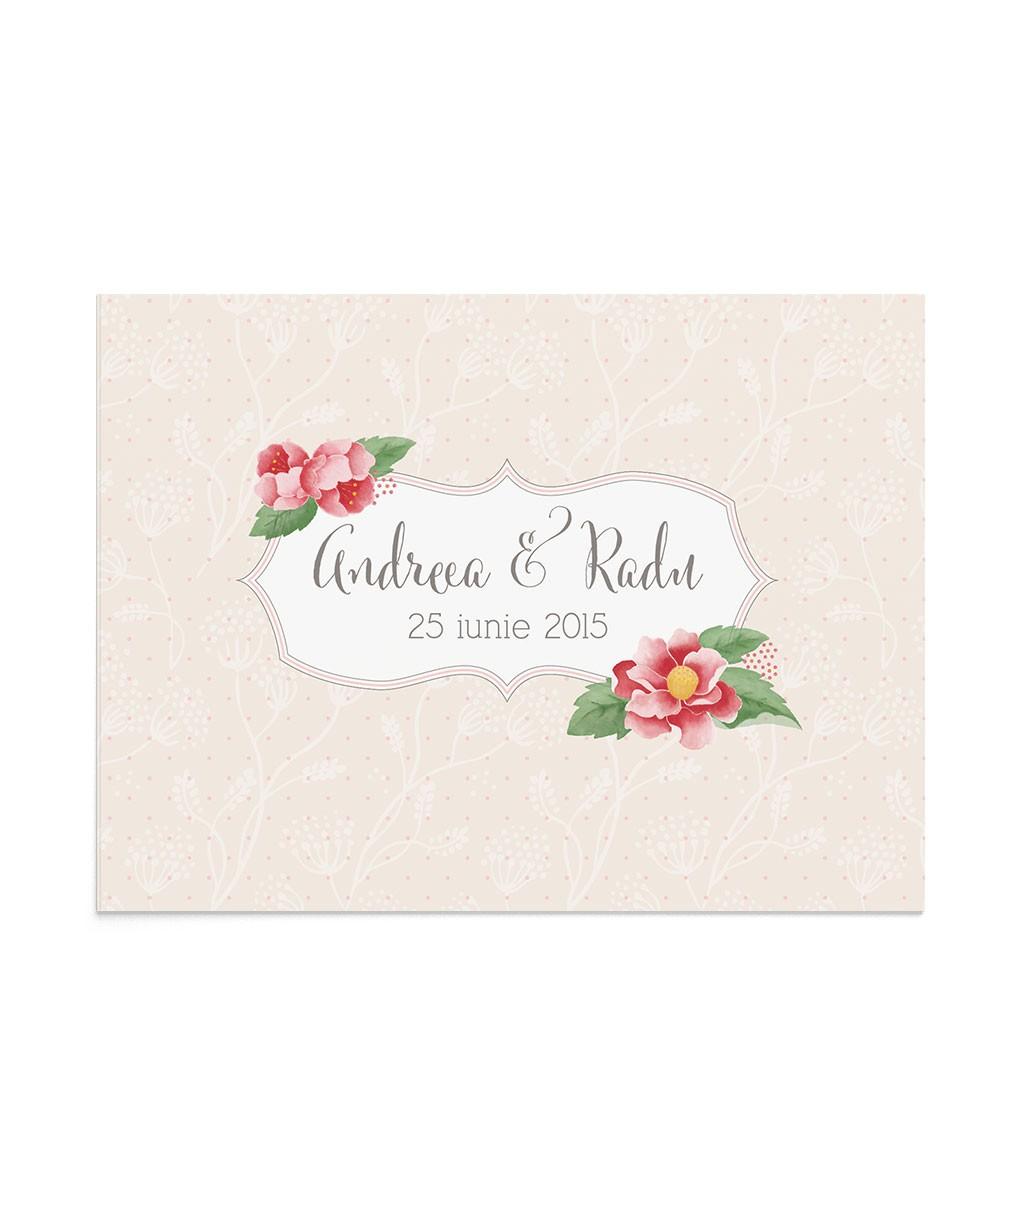 Invitatie de nunta Flowered Corners